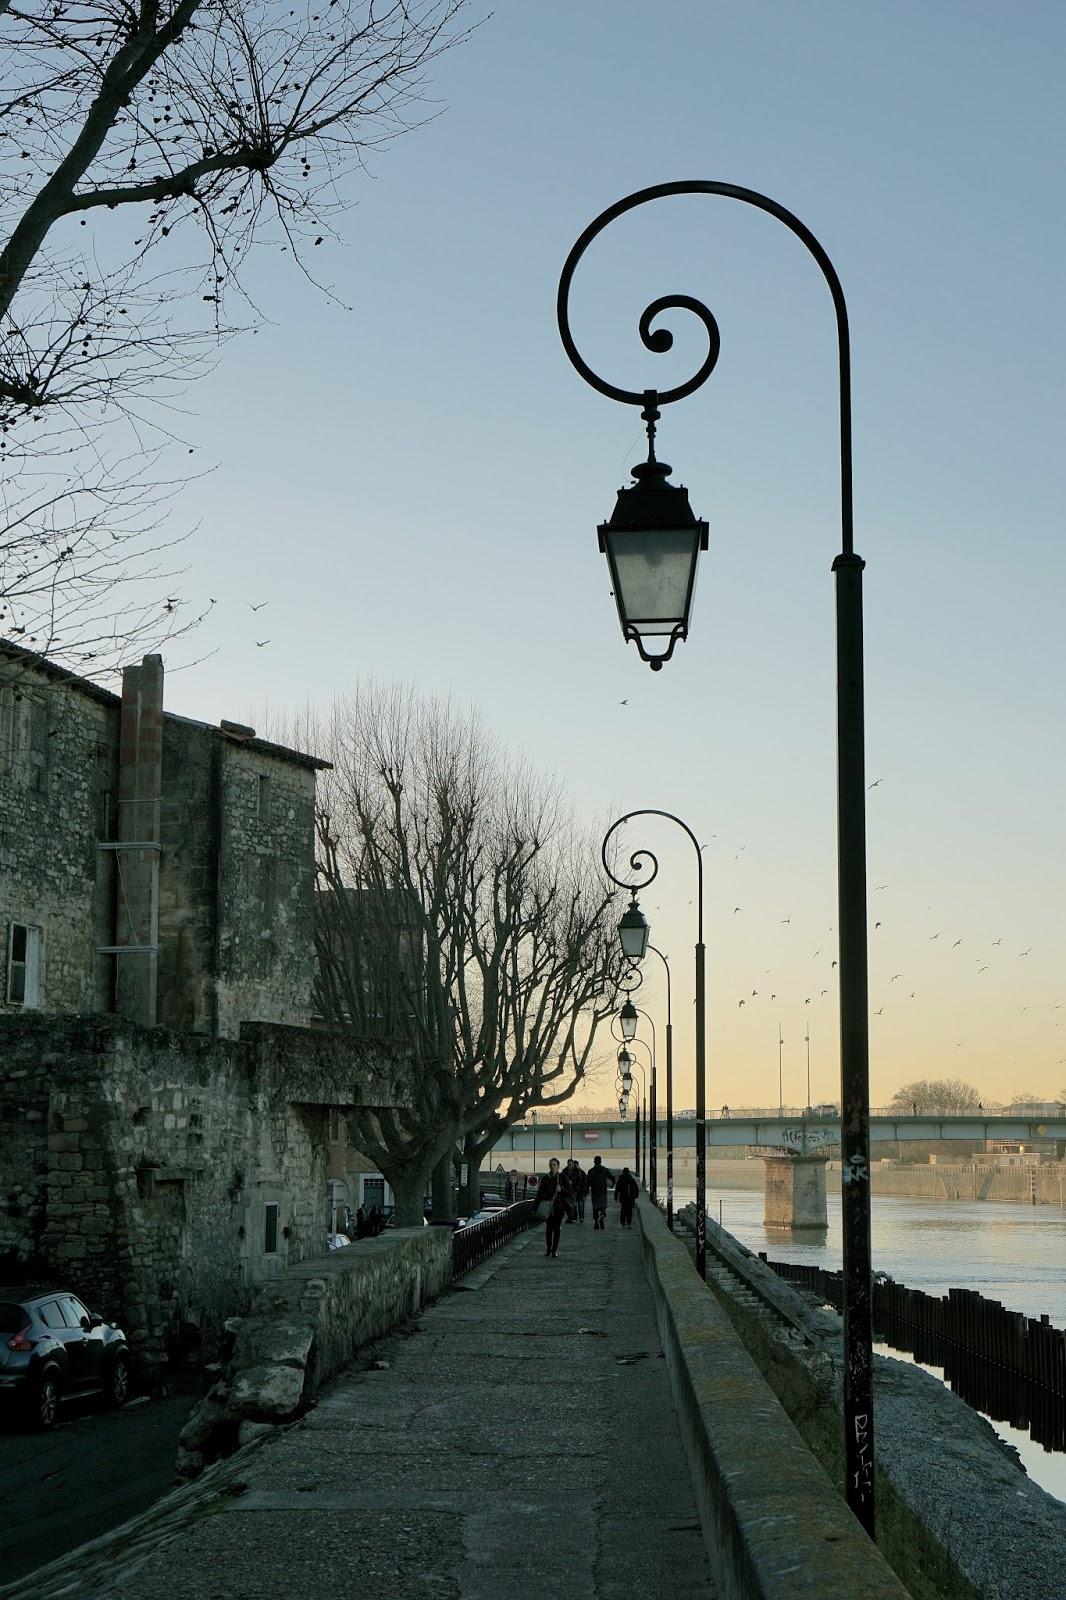 ローヌ川(La Rhône)